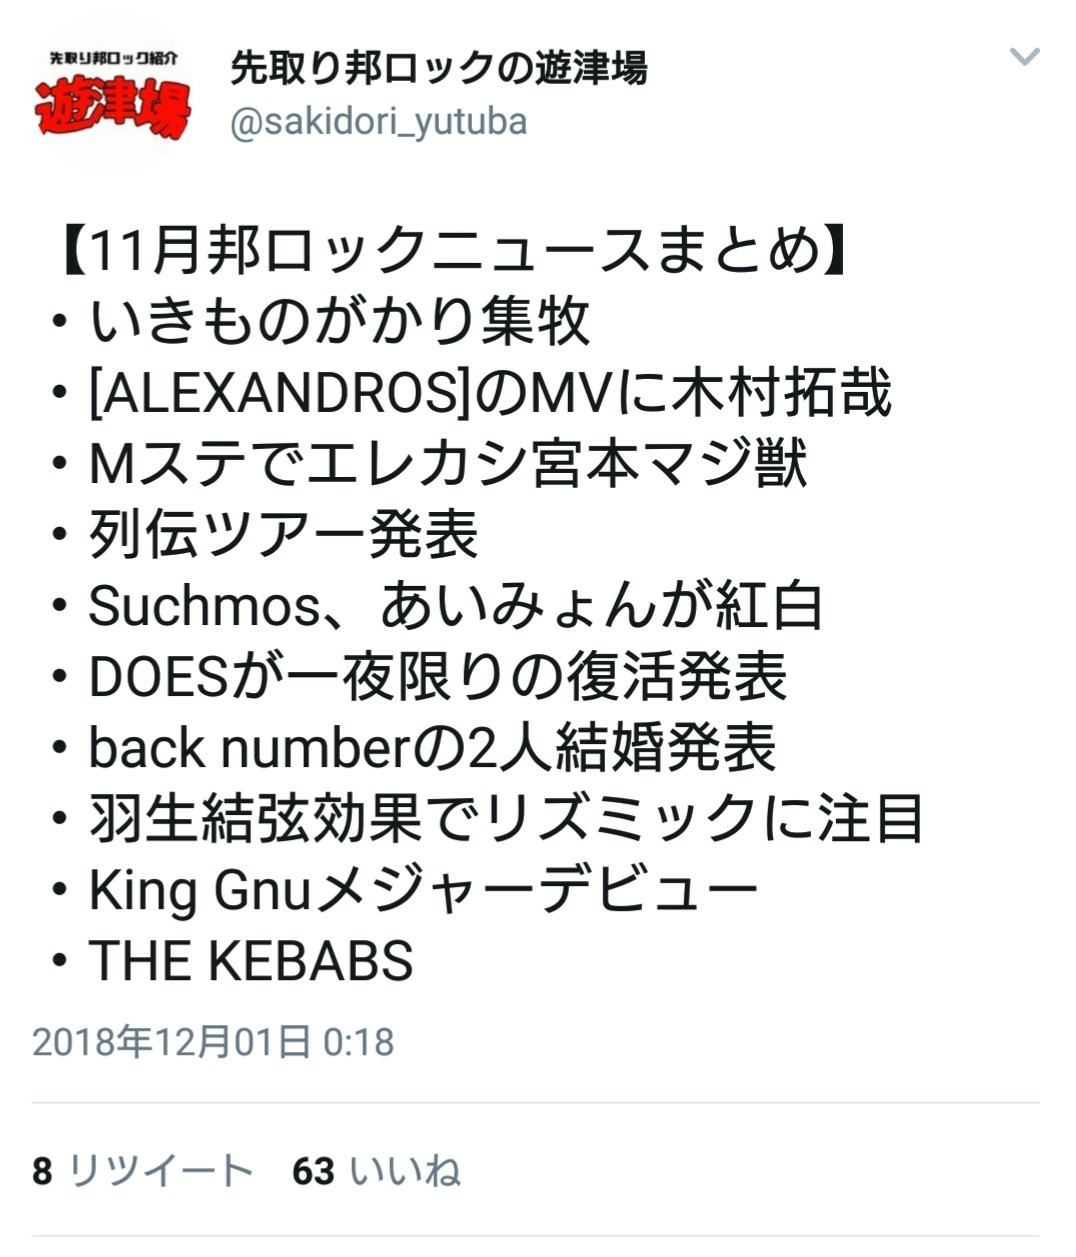 f:id:sakidoriyutsubarock:20181213223942j:plain